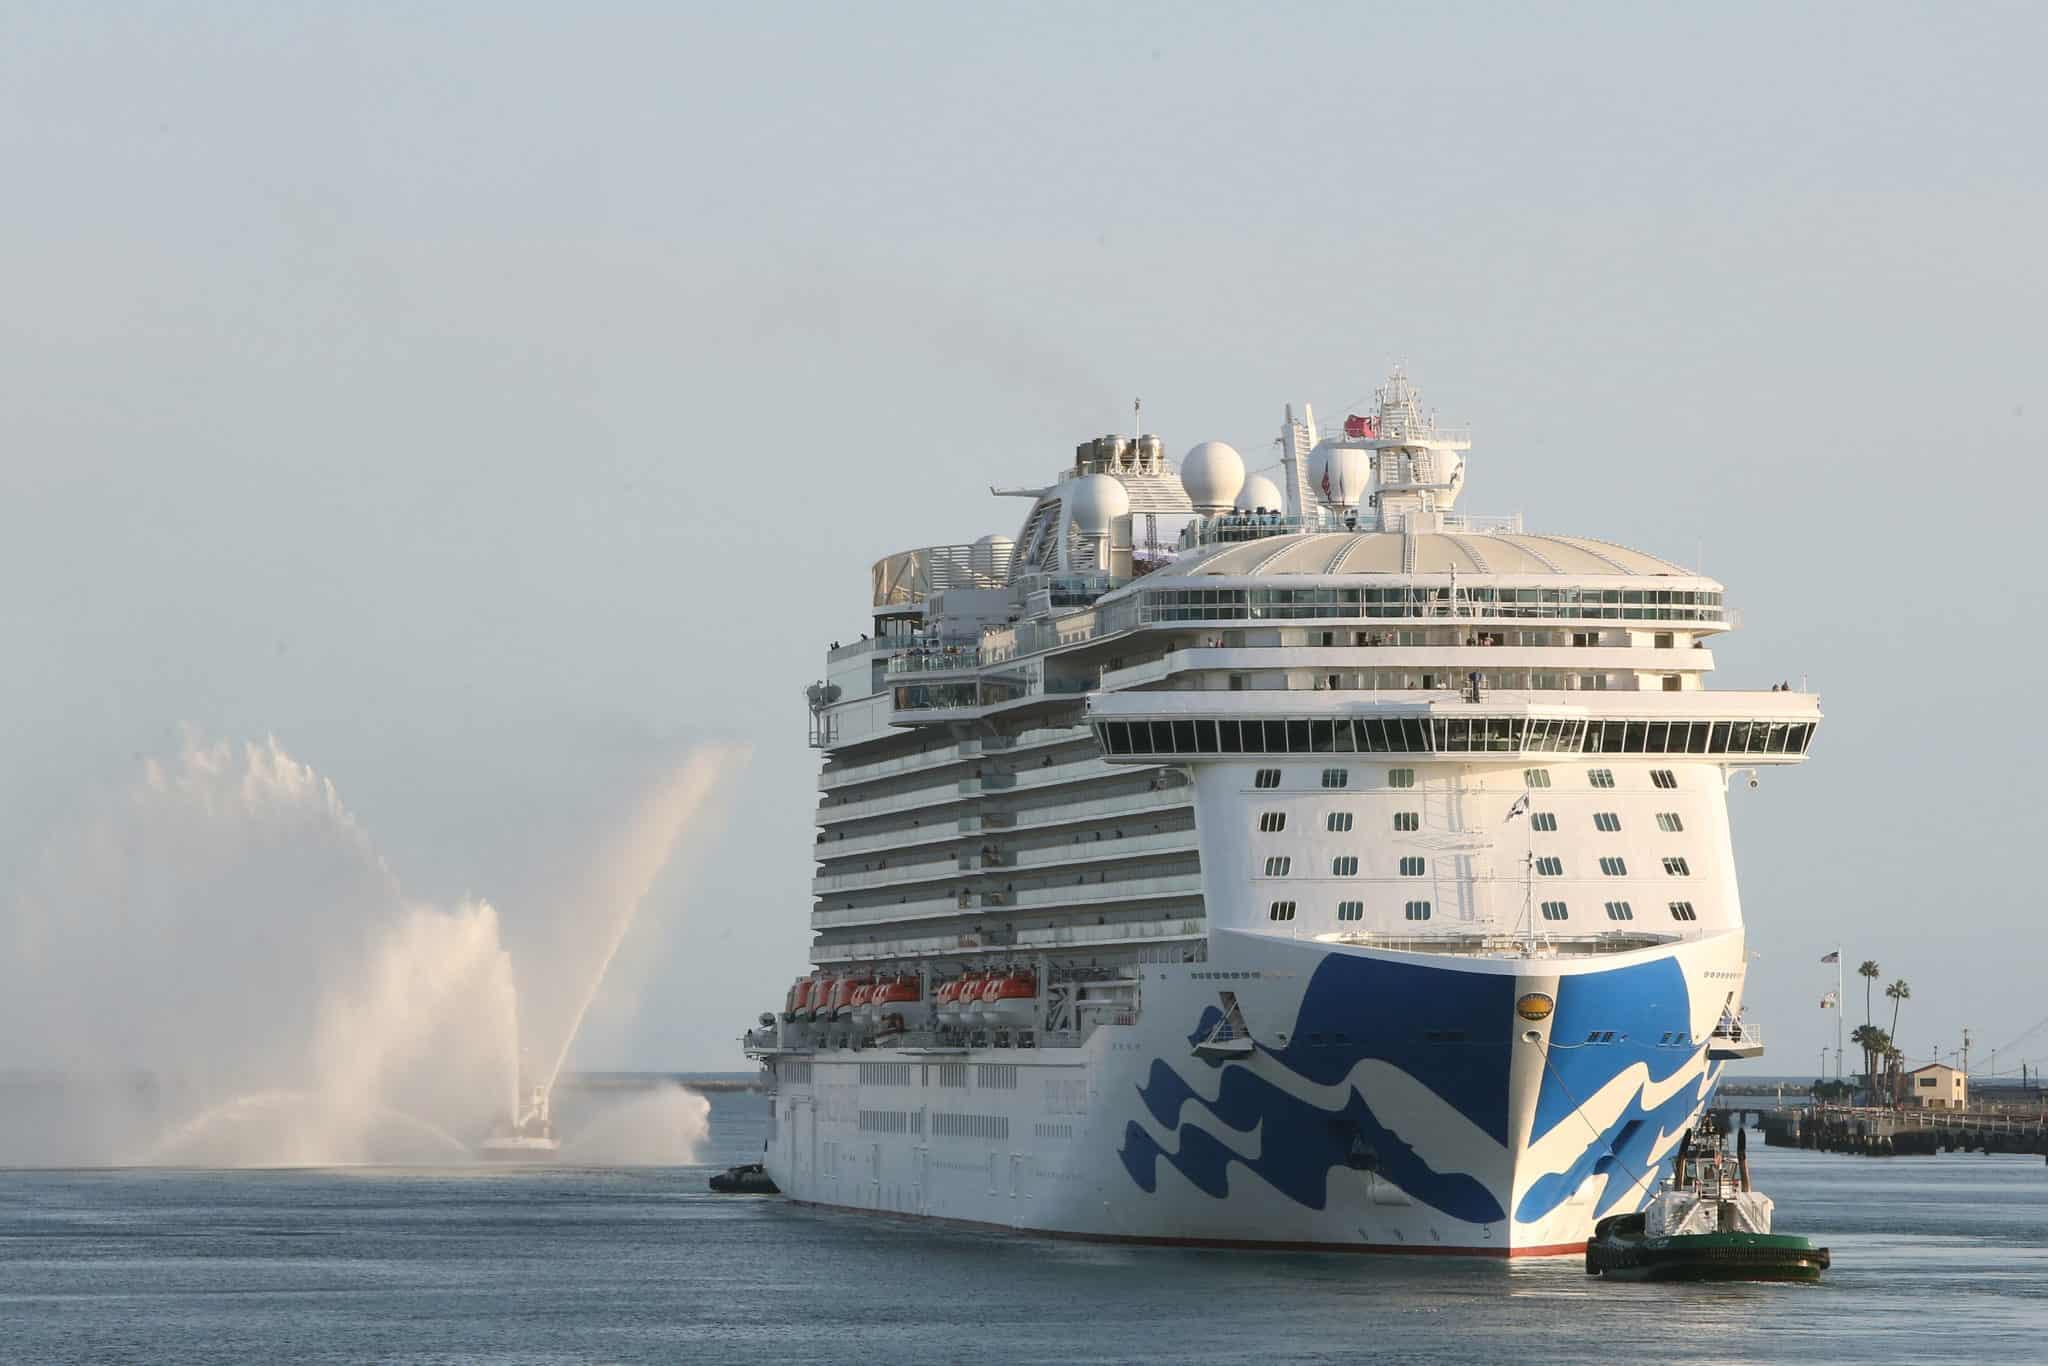 Princess Increases Cruise Gratuities In 2019